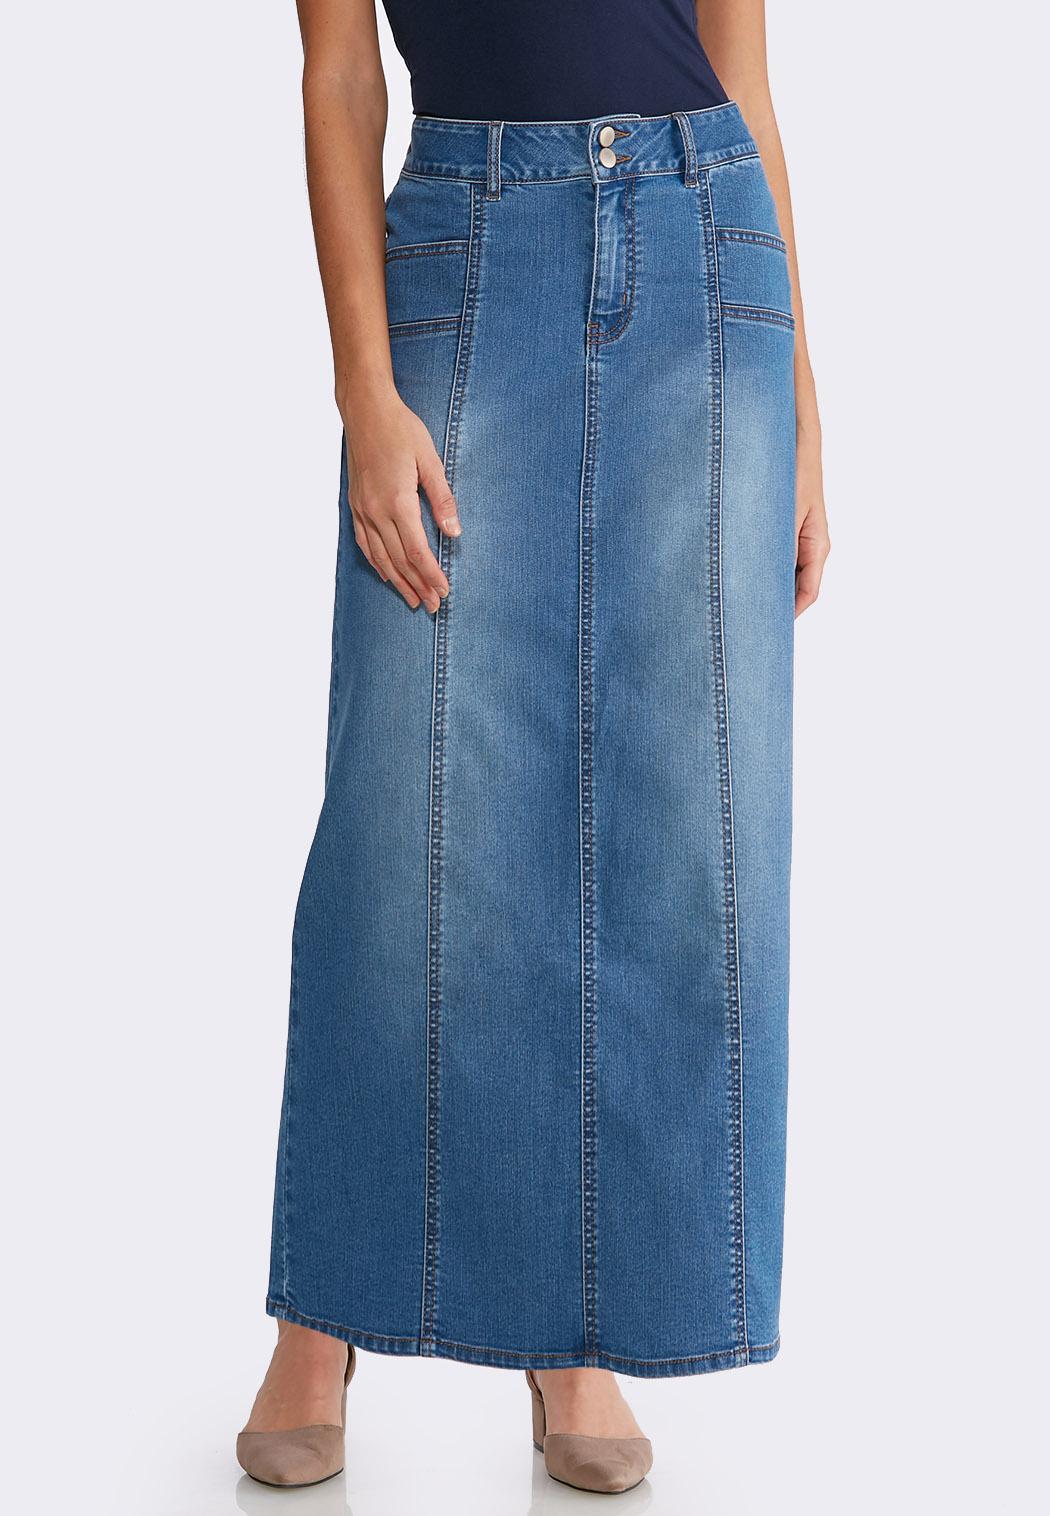 22a36010d80 Women s Plus Size Denim Skirts